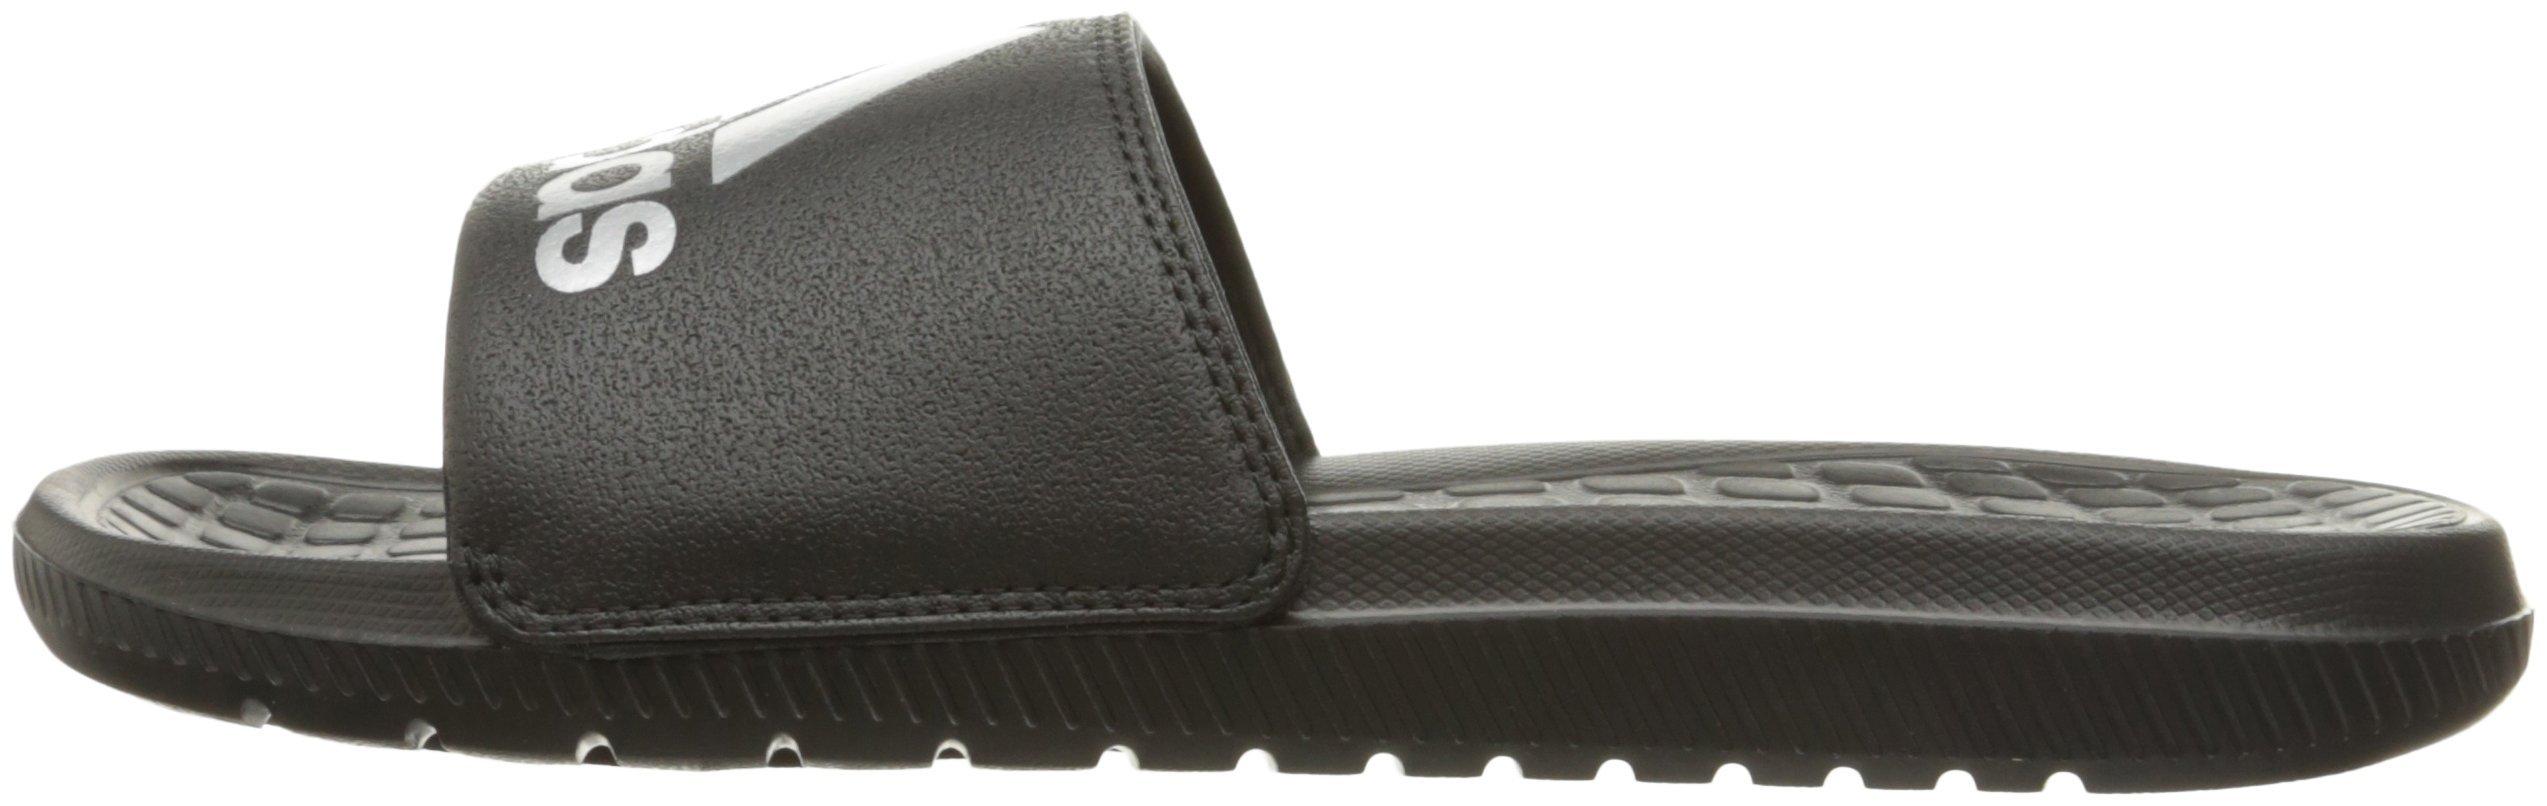 63c533cf334e adidas Men s Voloomix Slide Sandals